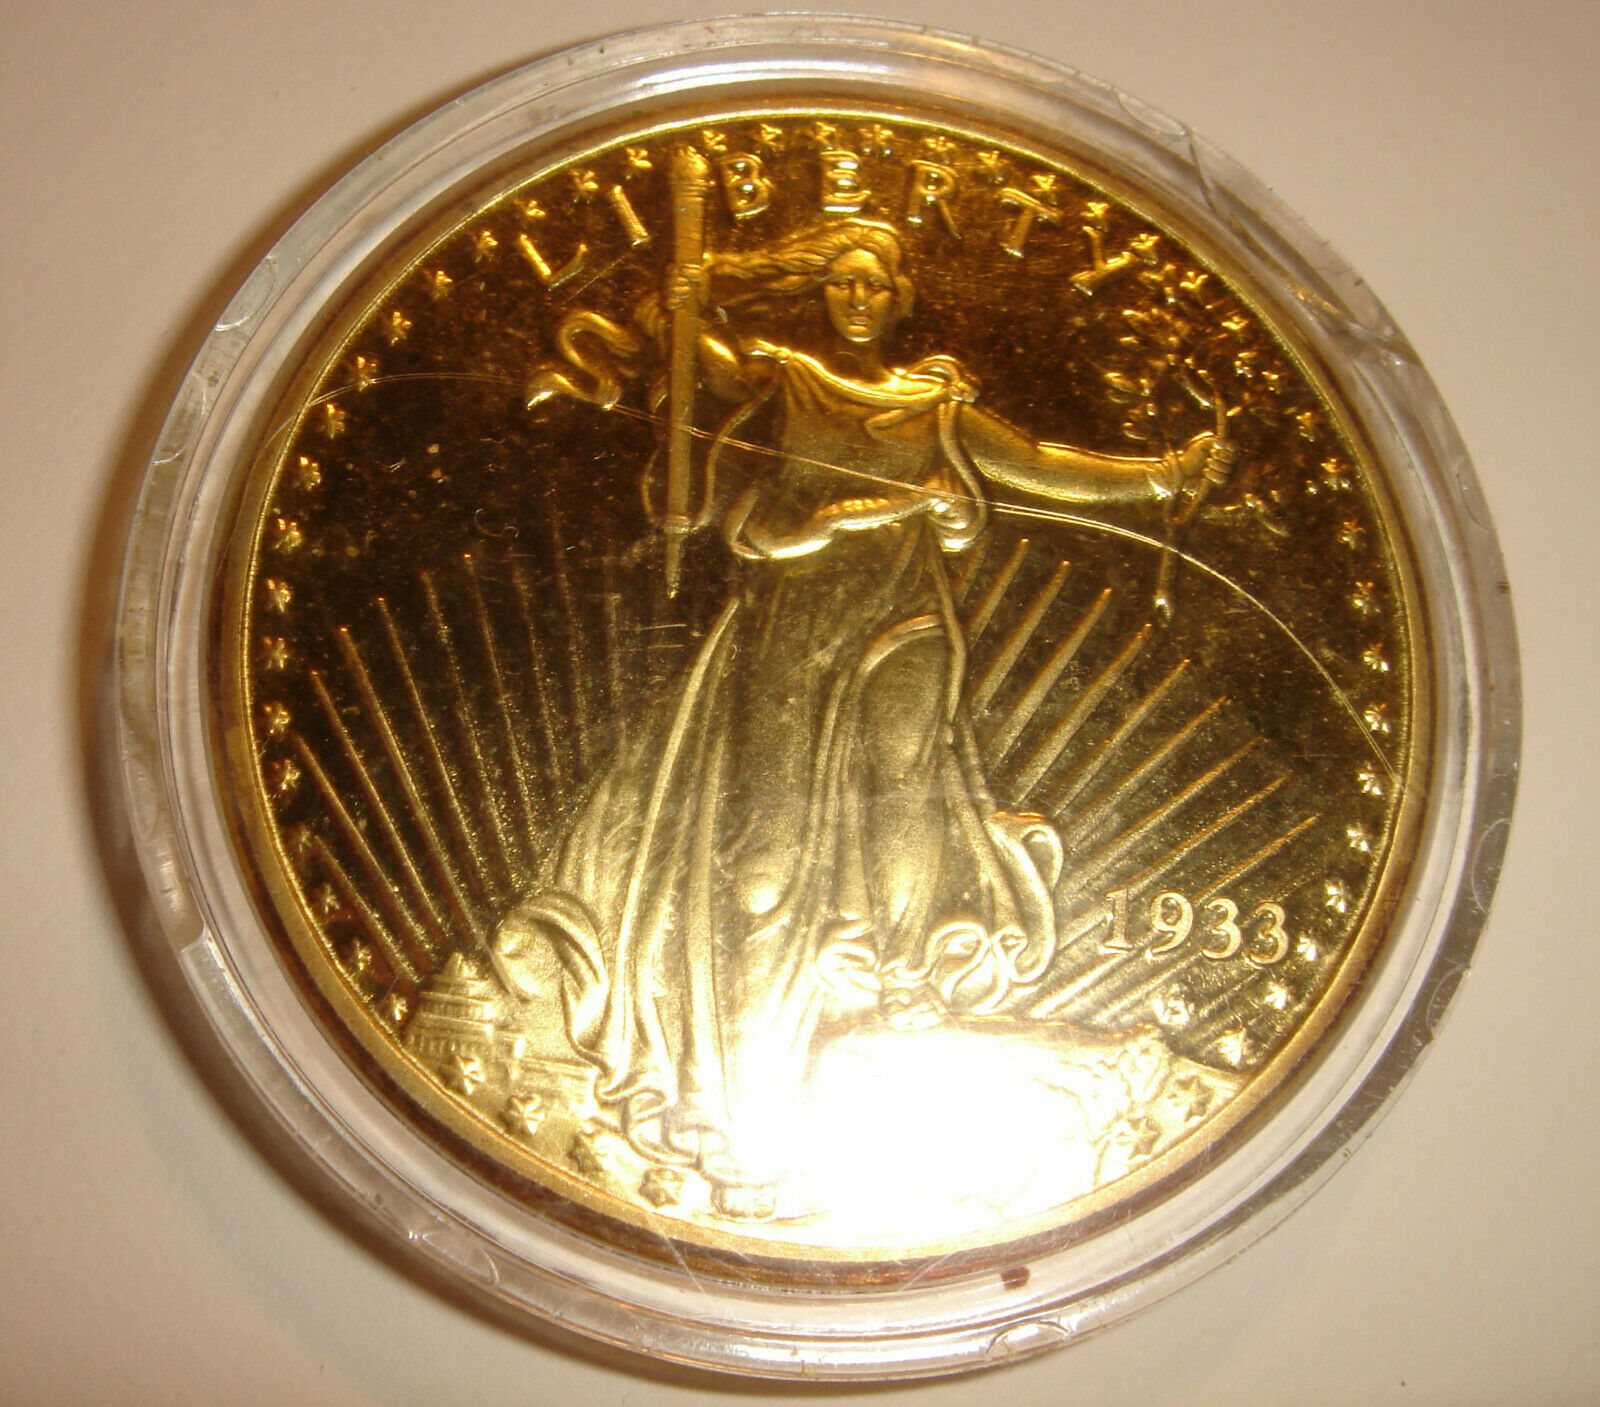 1933 LIBERTY AMERICAN GOLD EAGLE COIN SERIAL QJ0072 - $10.00